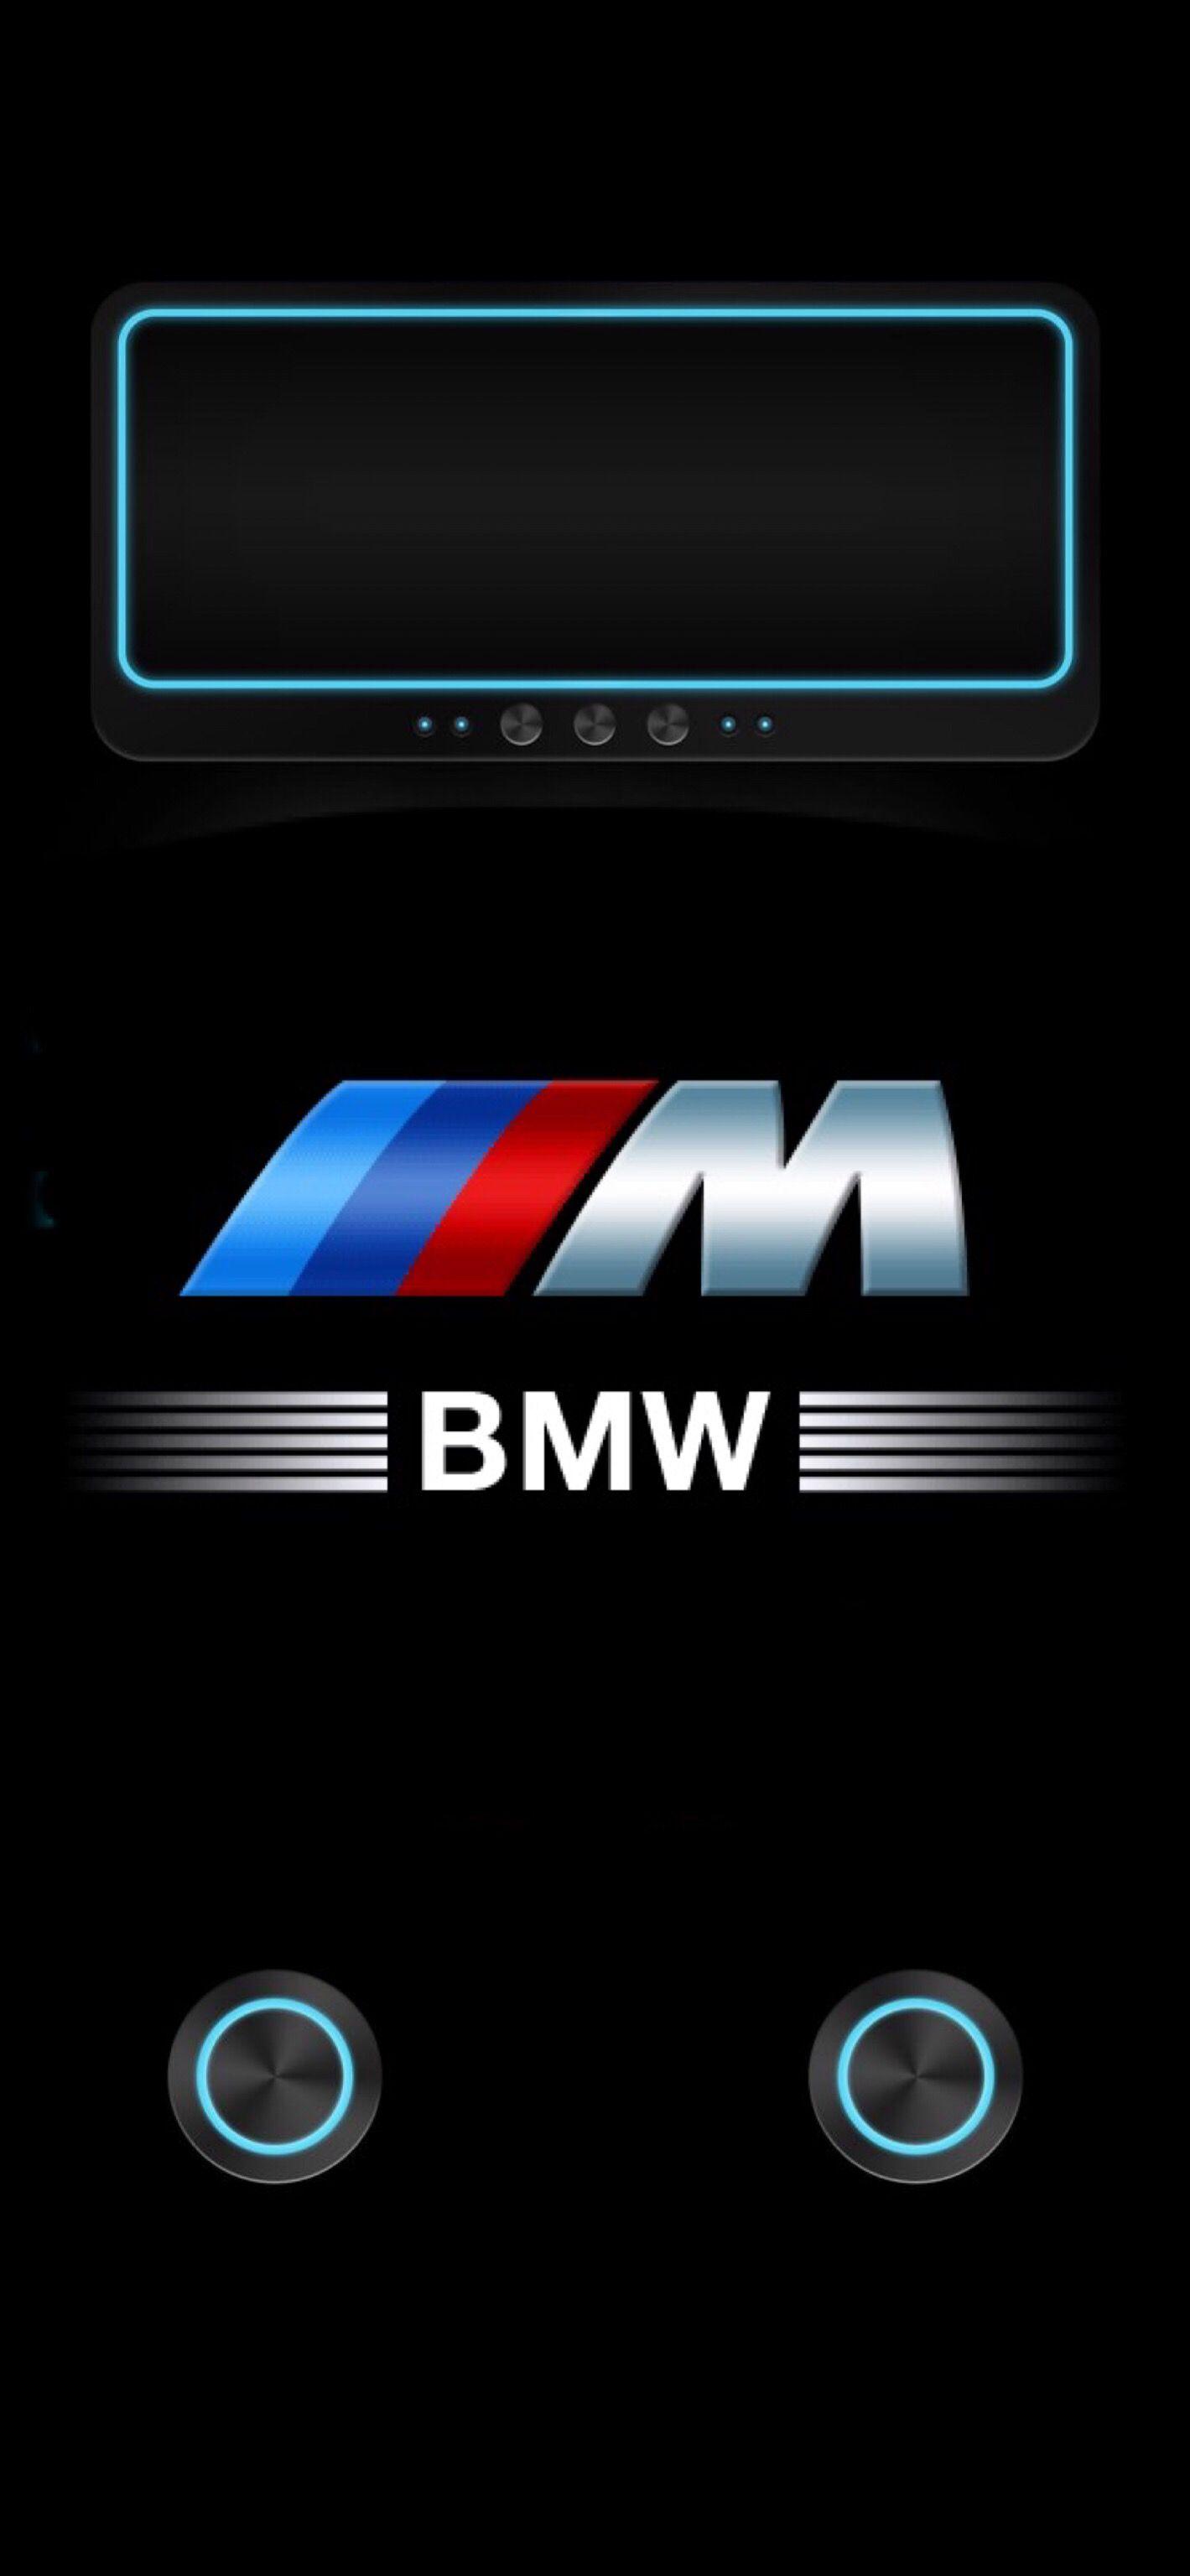 Wallpaper iPhone X - BMW ///M v2